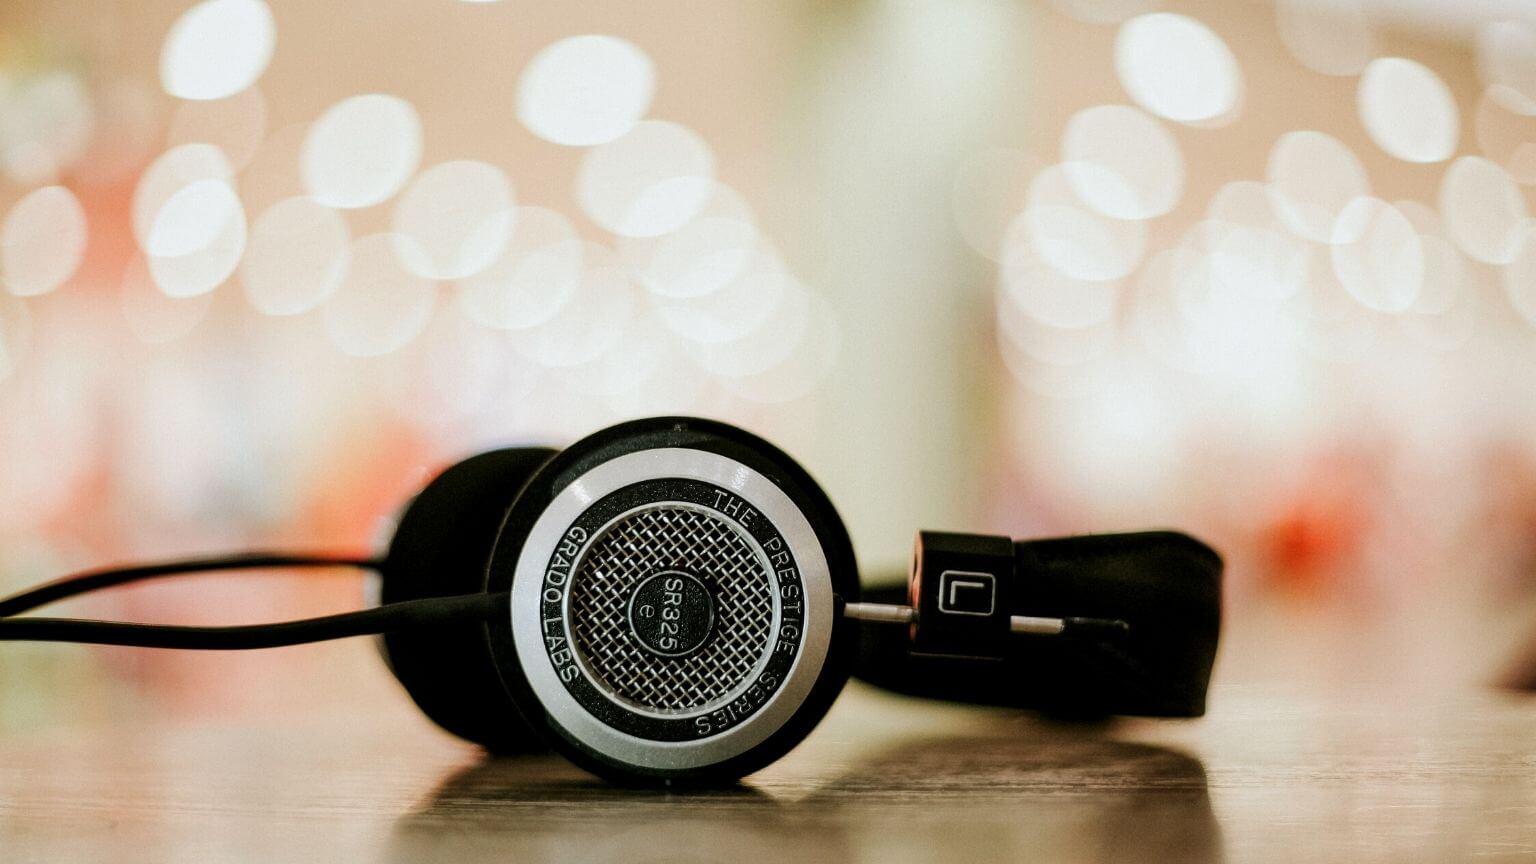 Les 9 podcasts qui m'inspirent au quotidien